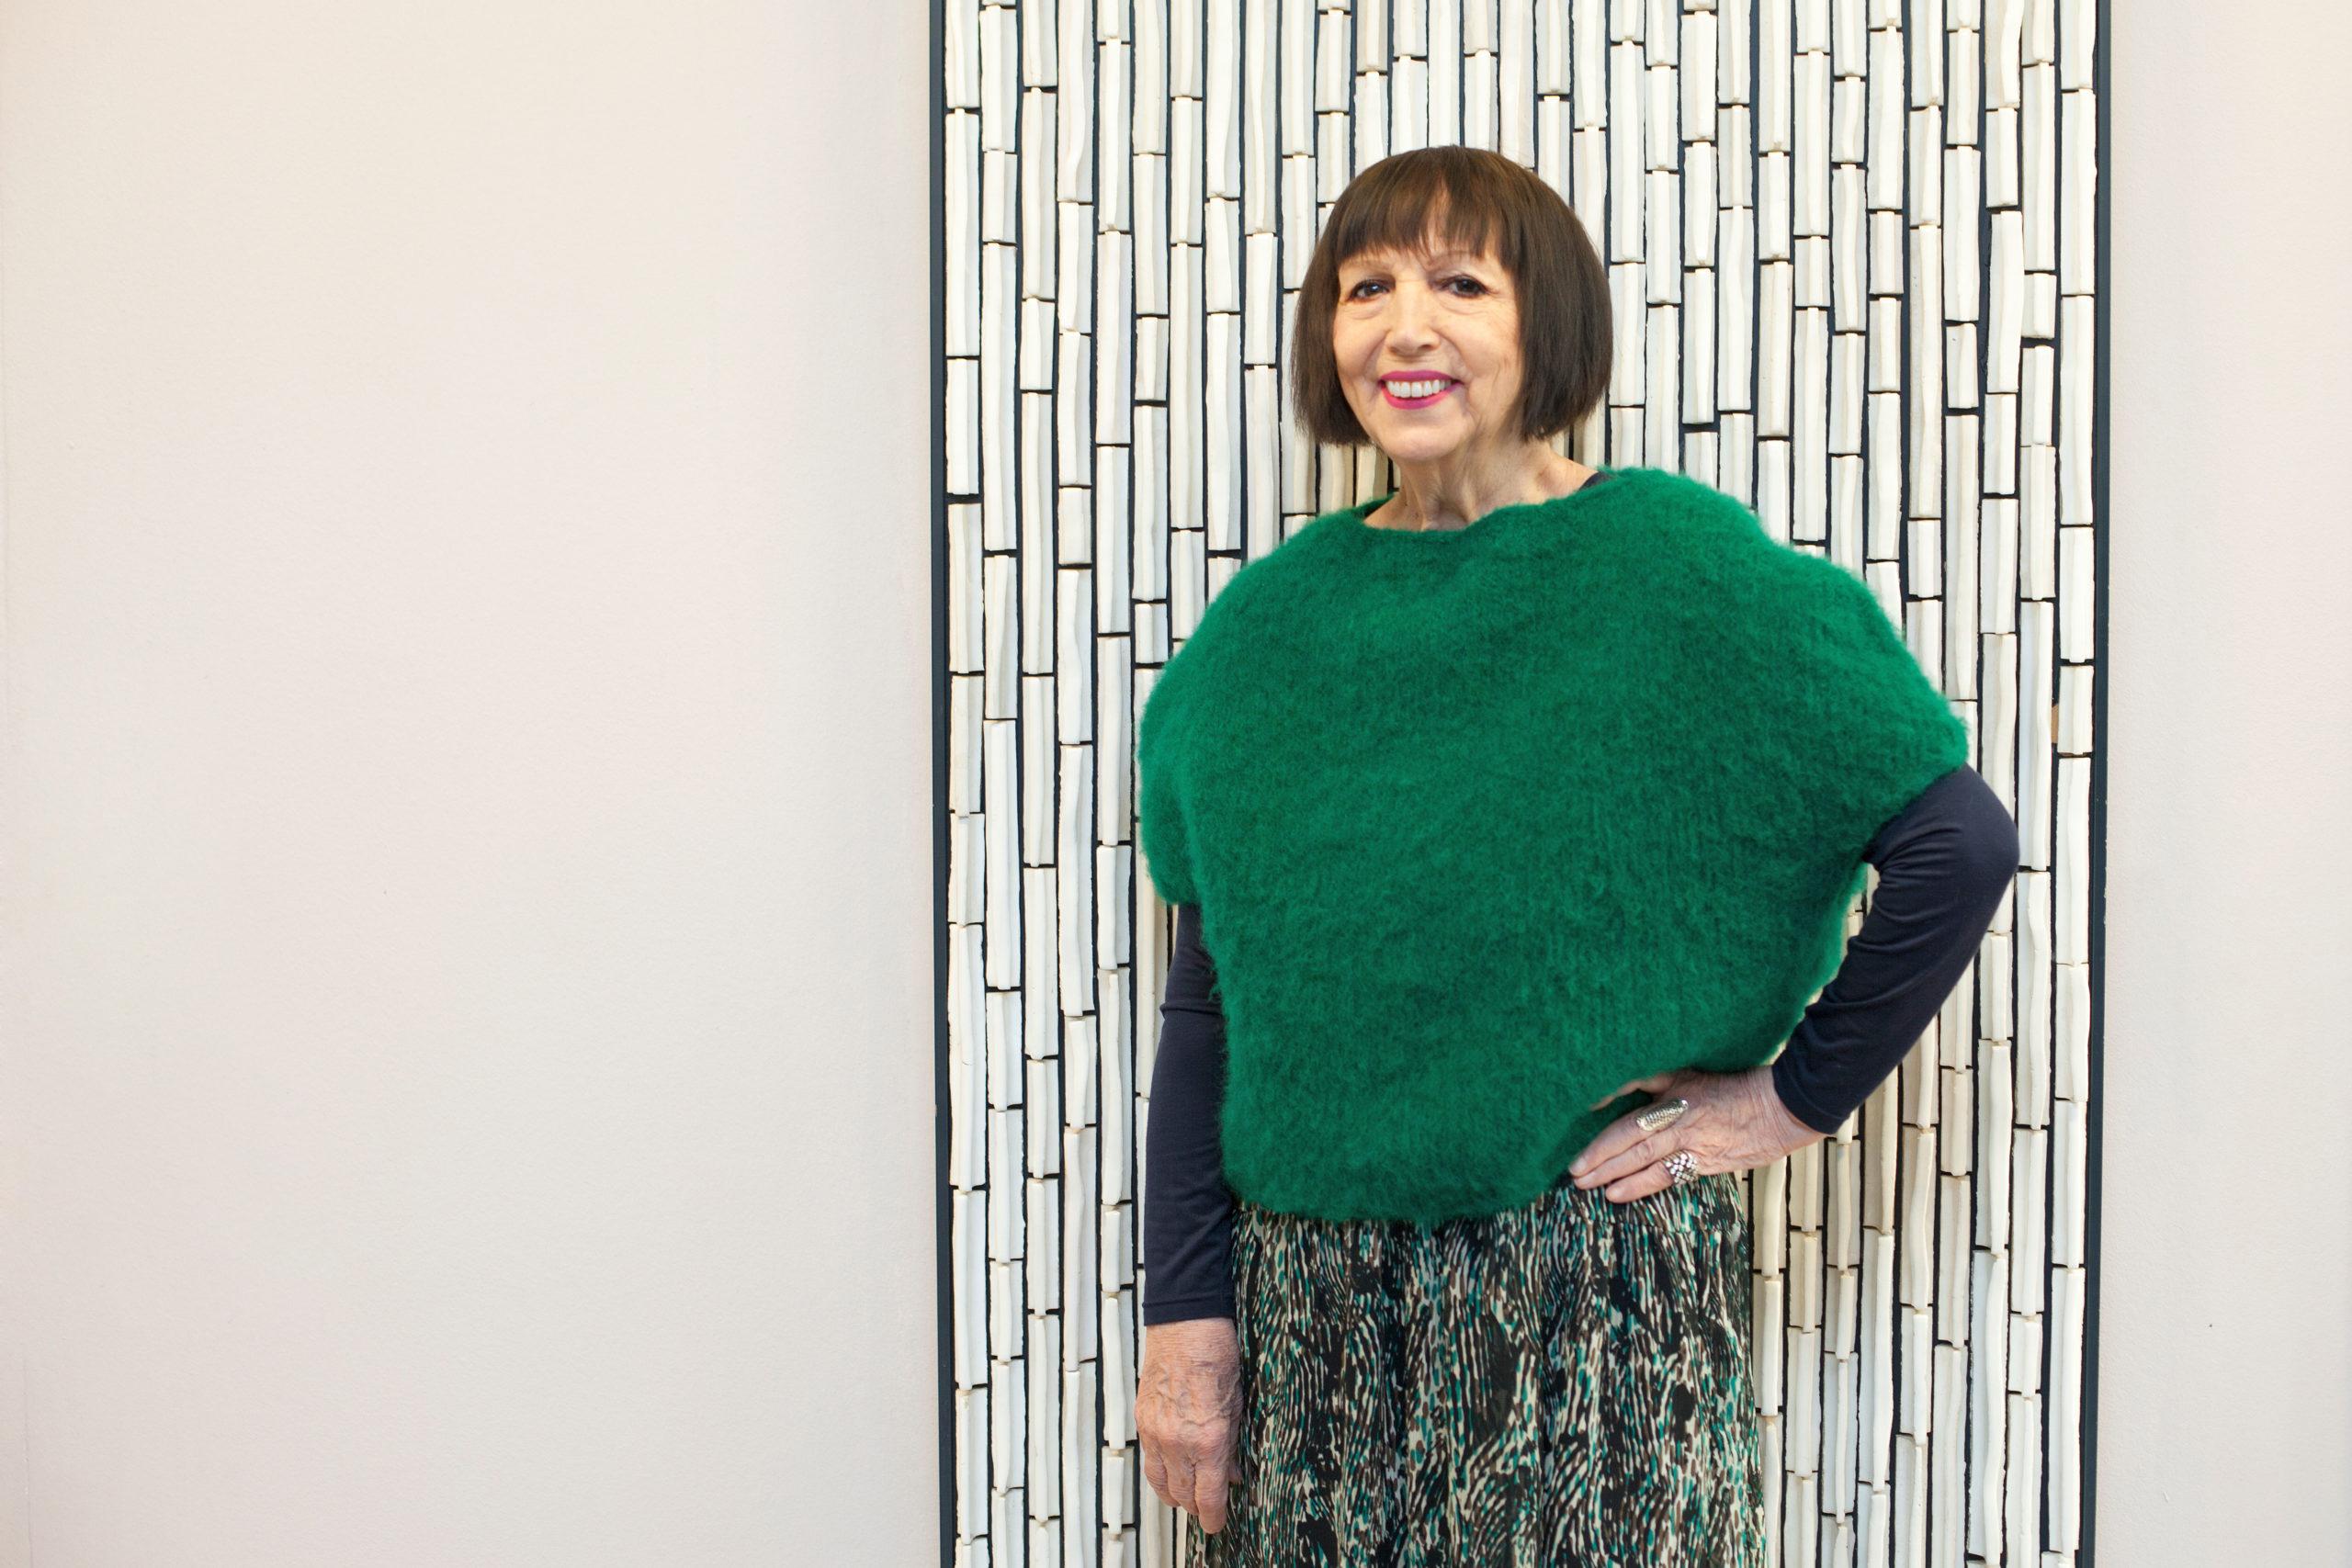 Die Berliner Modedesignerin Claudia Skoda. Foto: Patricia Schichl